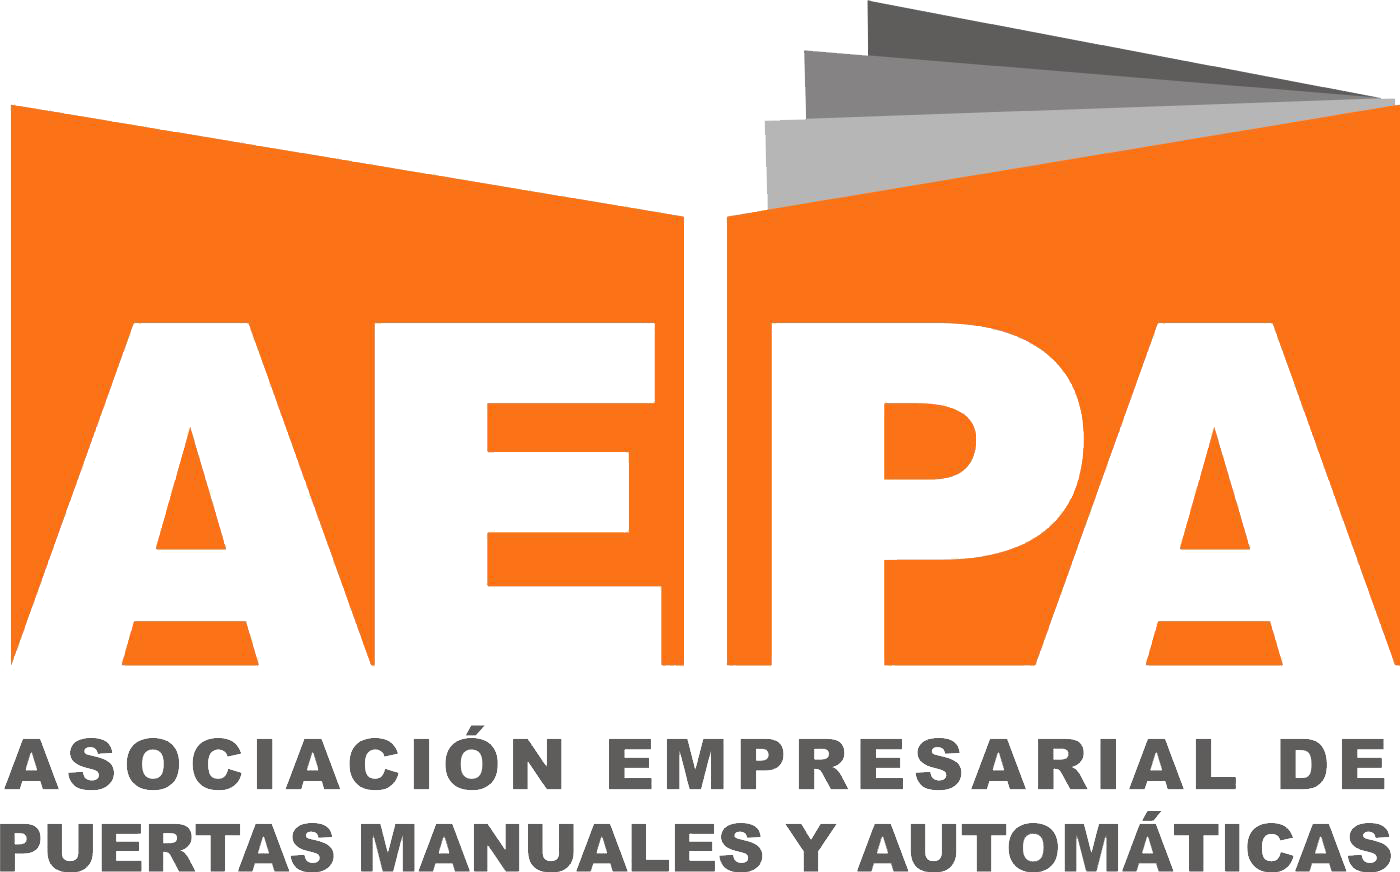 Miembro Fundador de AEPA